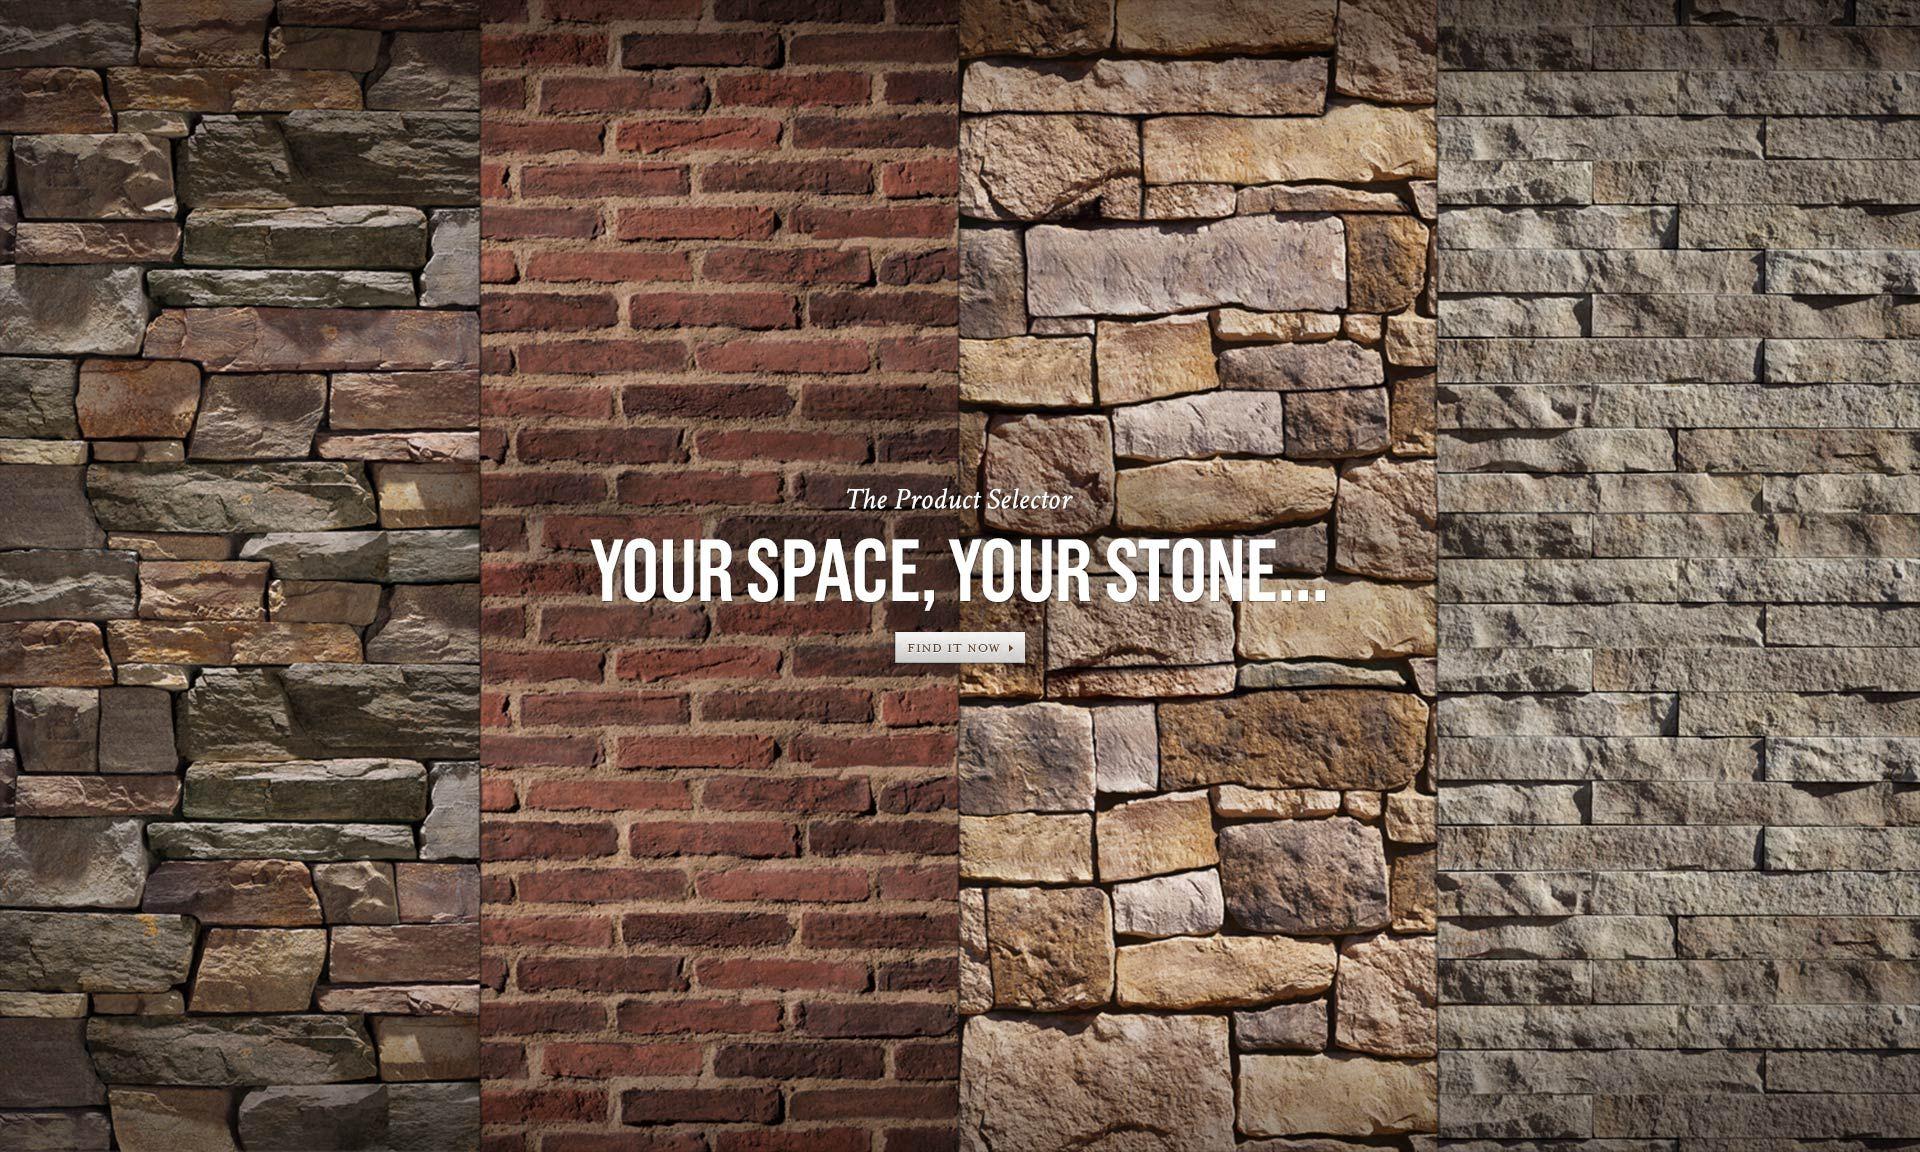 Eldorado Stone Stone Veneer Architectural Stone And Brick Products In Victoria Stone Architecture Stone Veneer Eldorado Stone